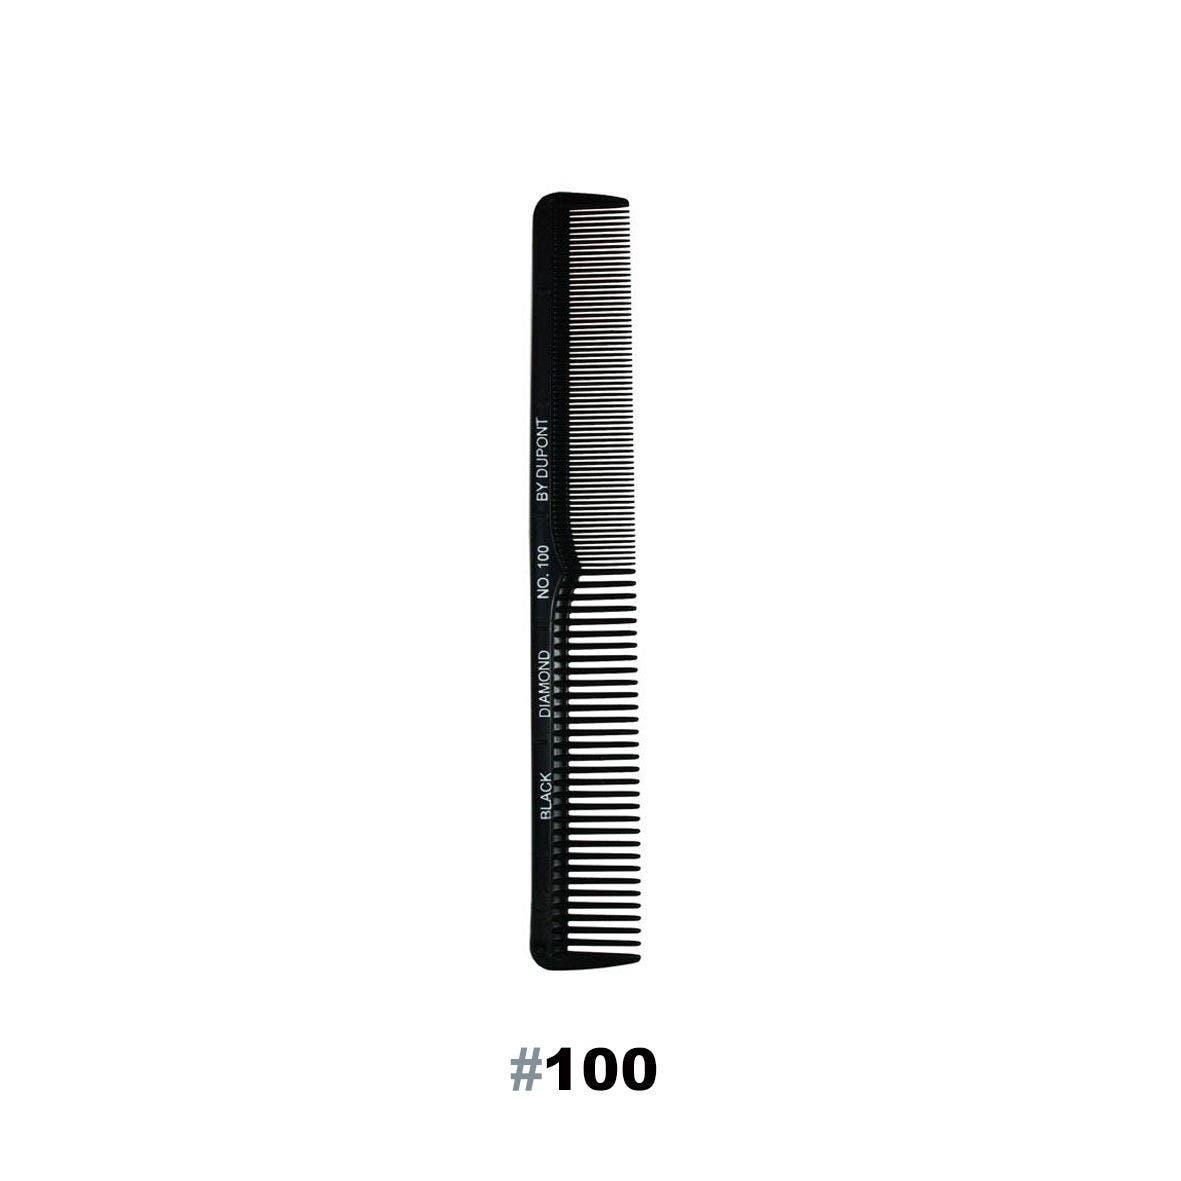 "BLACK DIAMOND #100 Cutting 7"" Hair Comb - Made in USA"